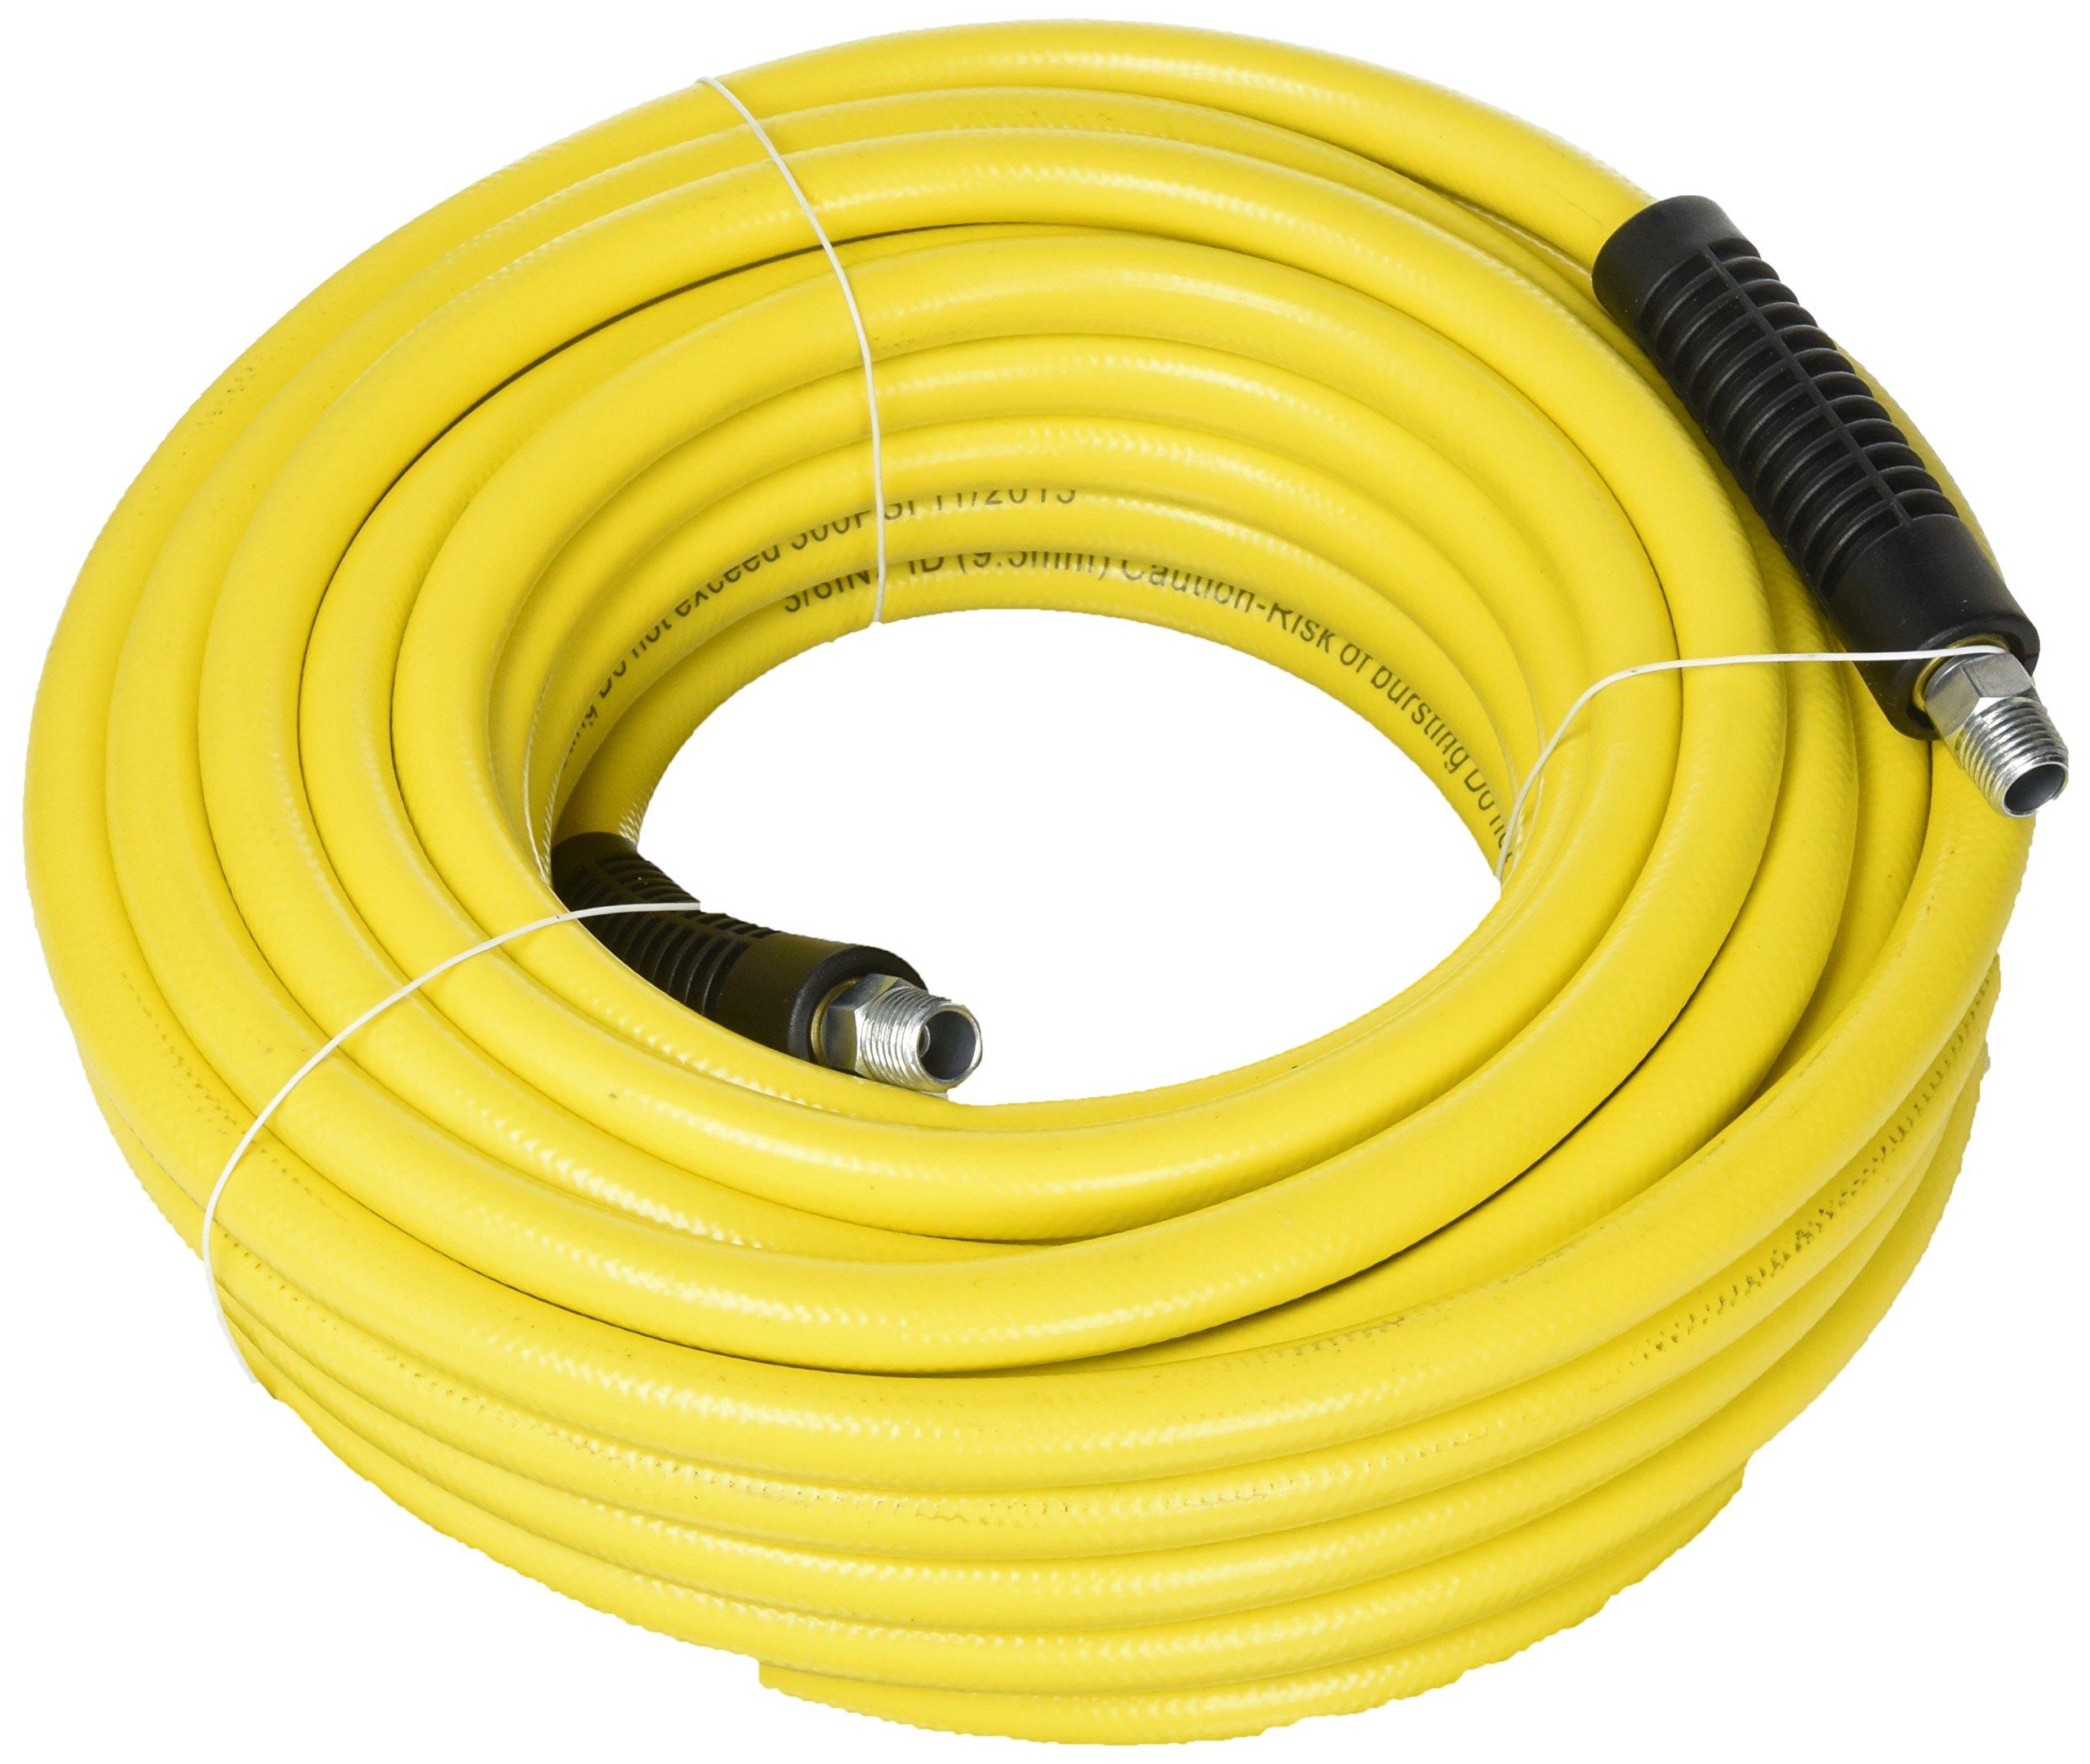 Tradespro 835868 PVC Air Hose, 3/8'', 50'